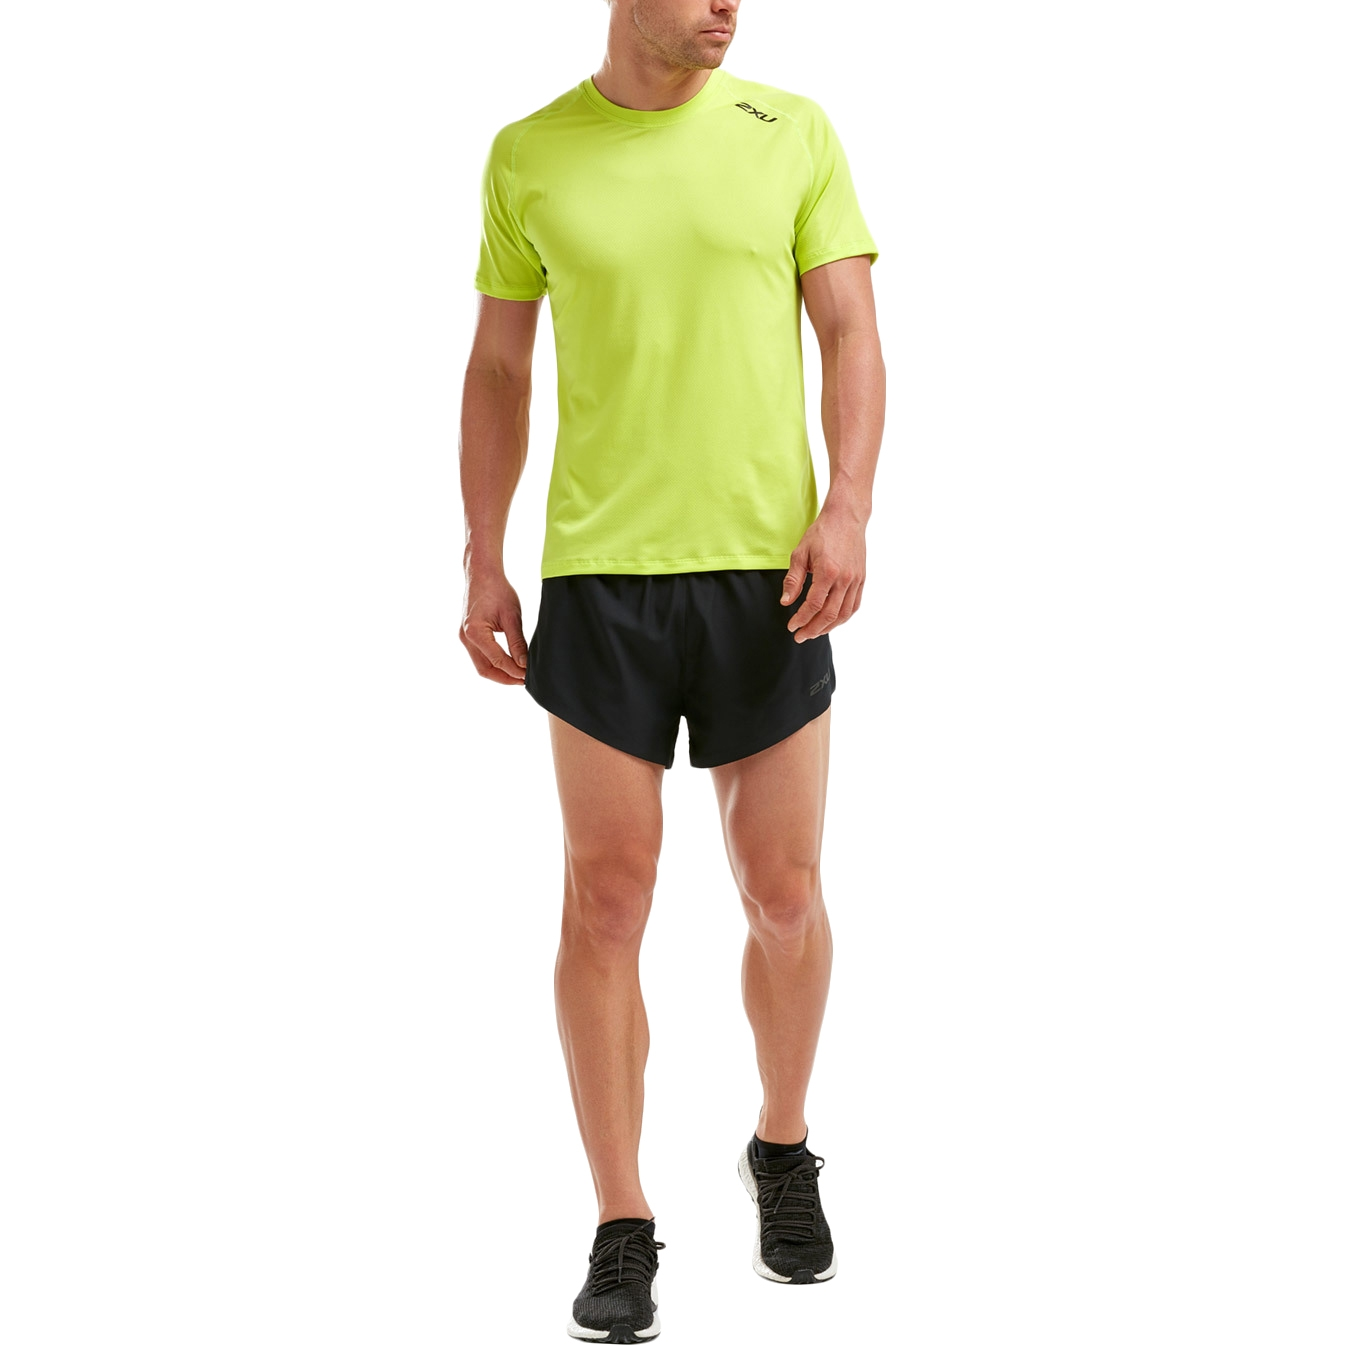 Мужская футболка для бега 2XU серия GHST цена